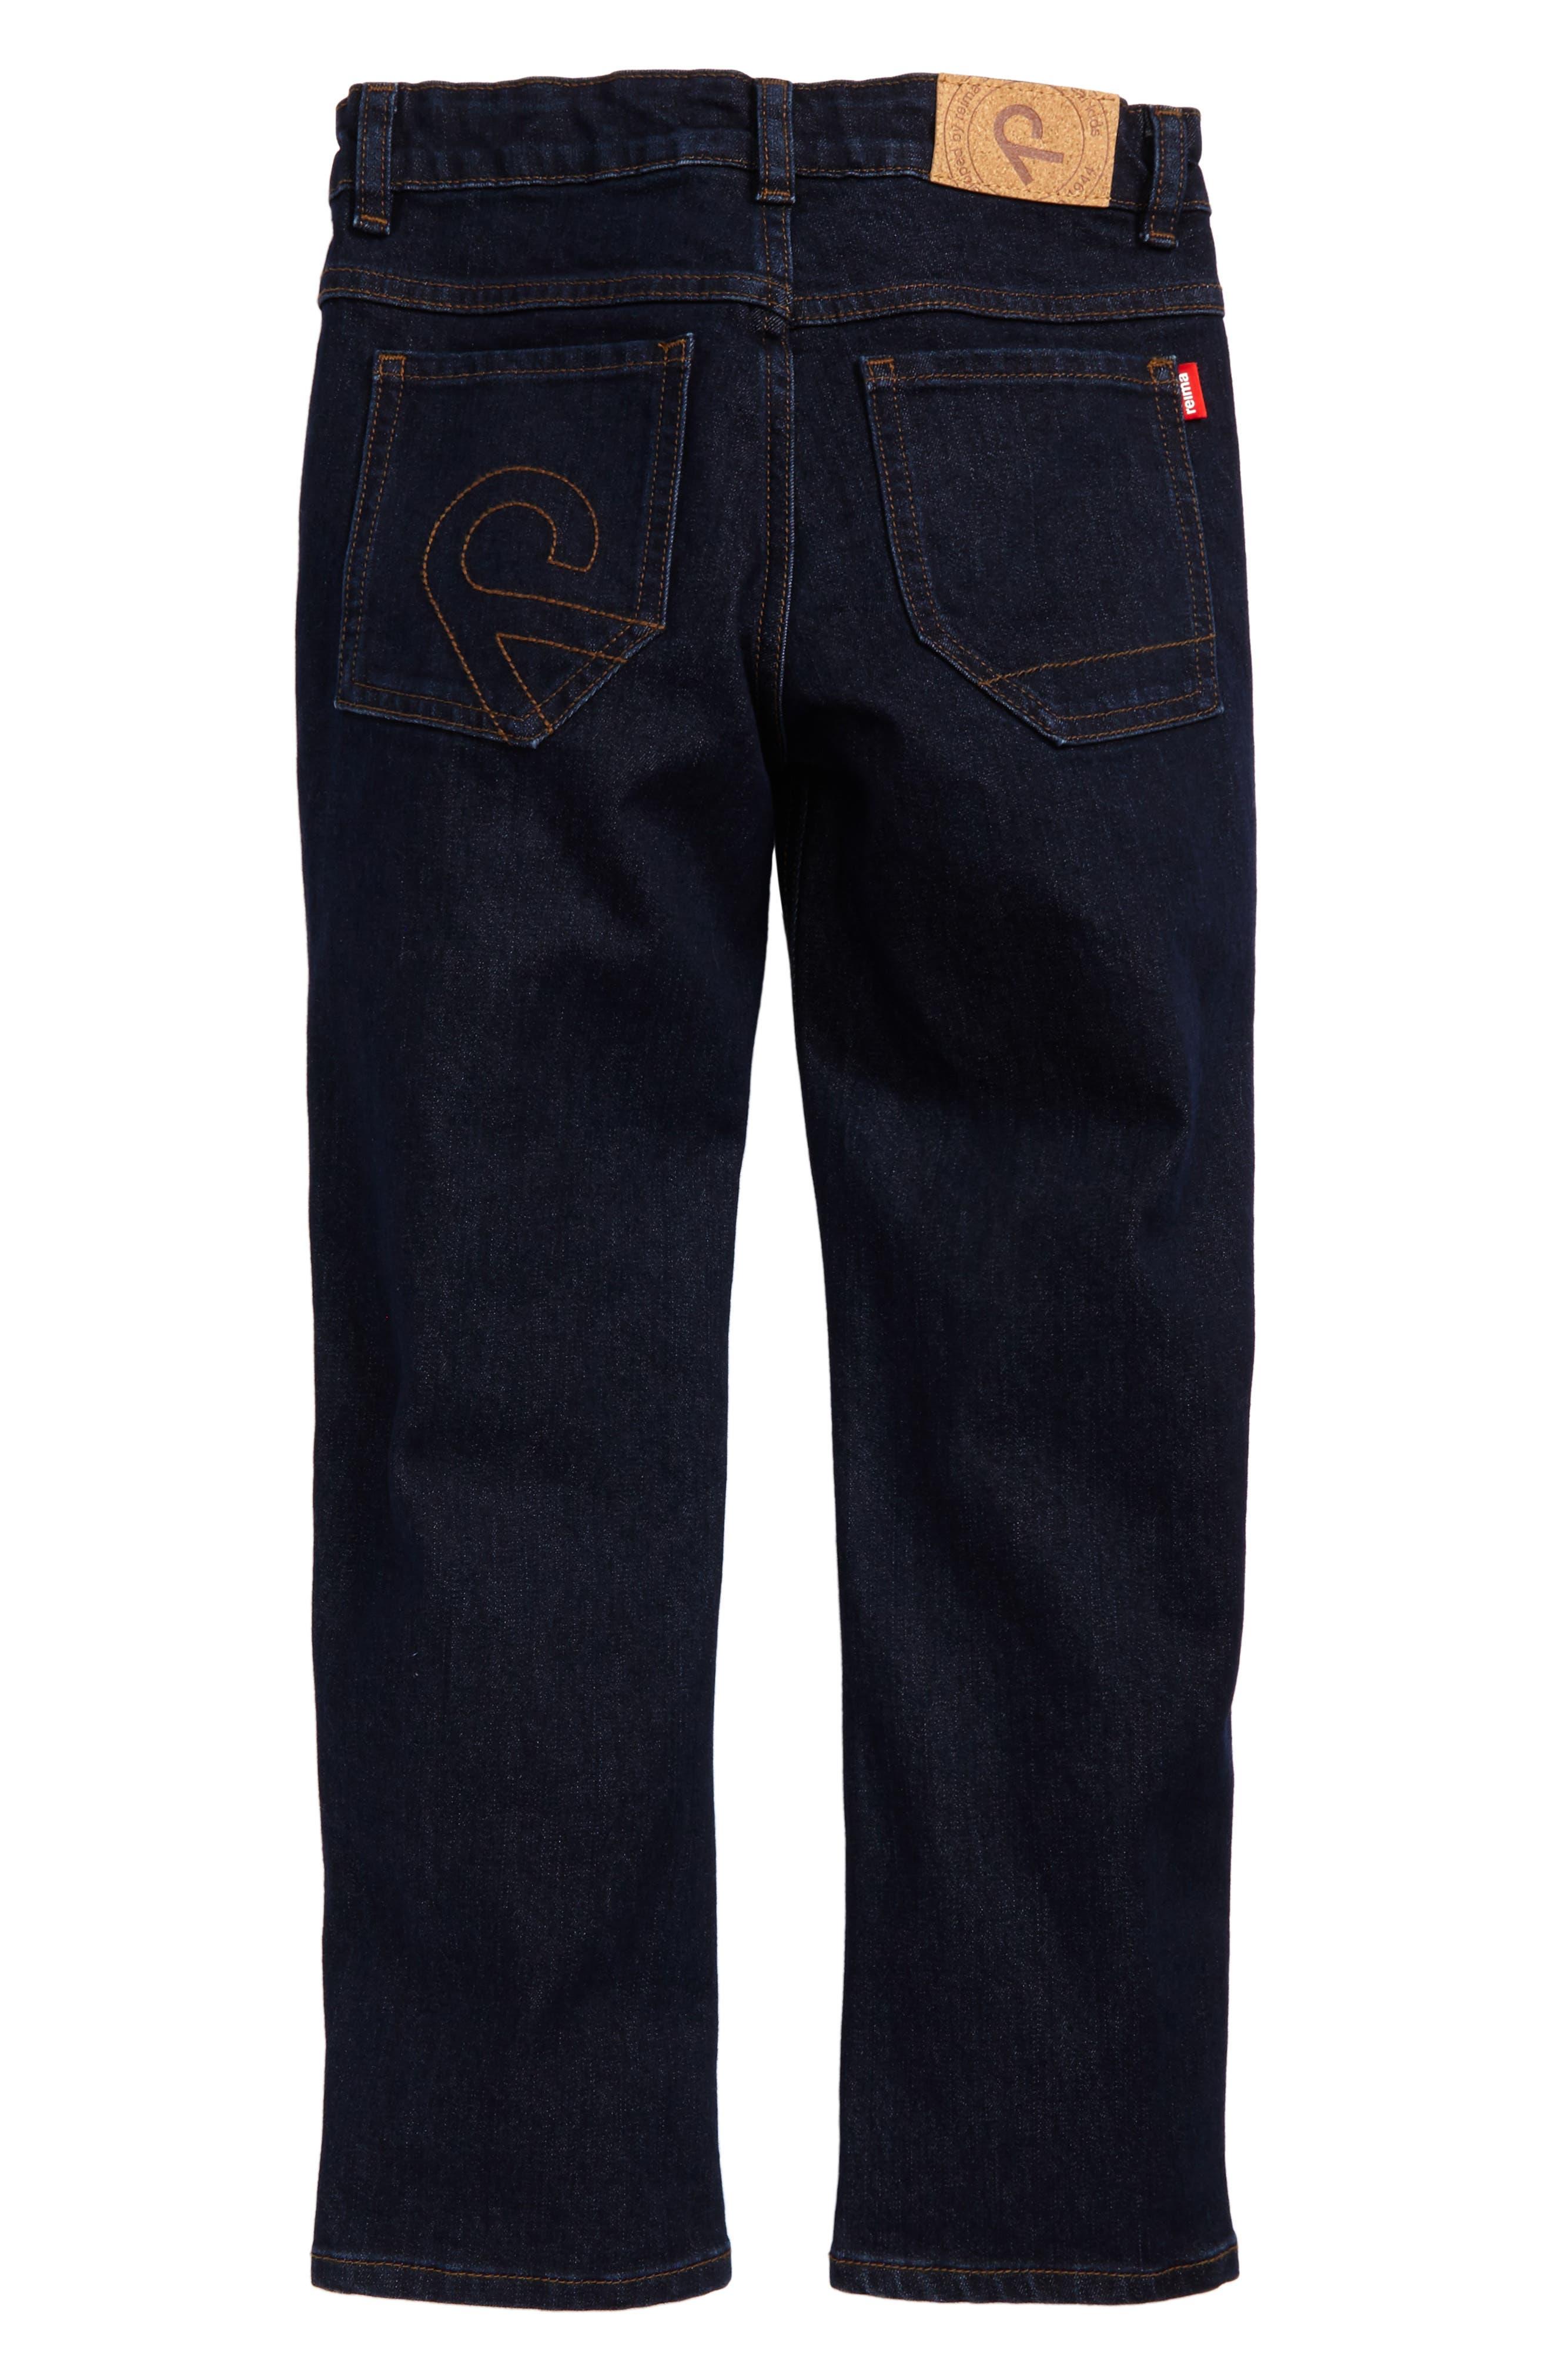 Trick Straight Leg Jeans,                             Alternate thumbnail 2, color,                             400